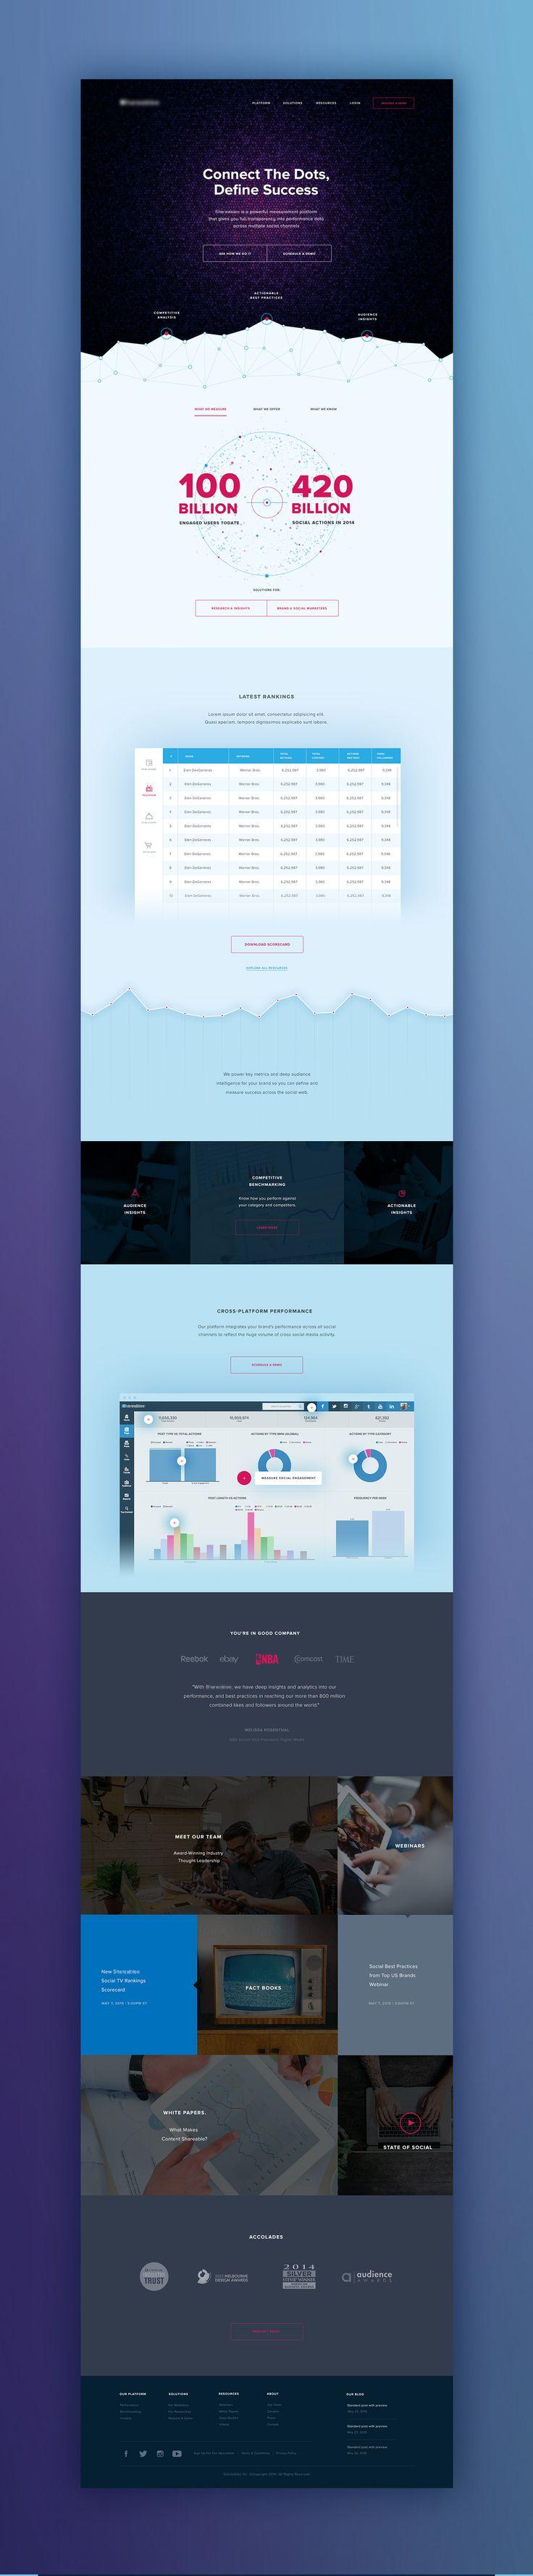 Landing page WIP by @ponsgroup via #dribbble #ui #landingpage #webdesign #homepage